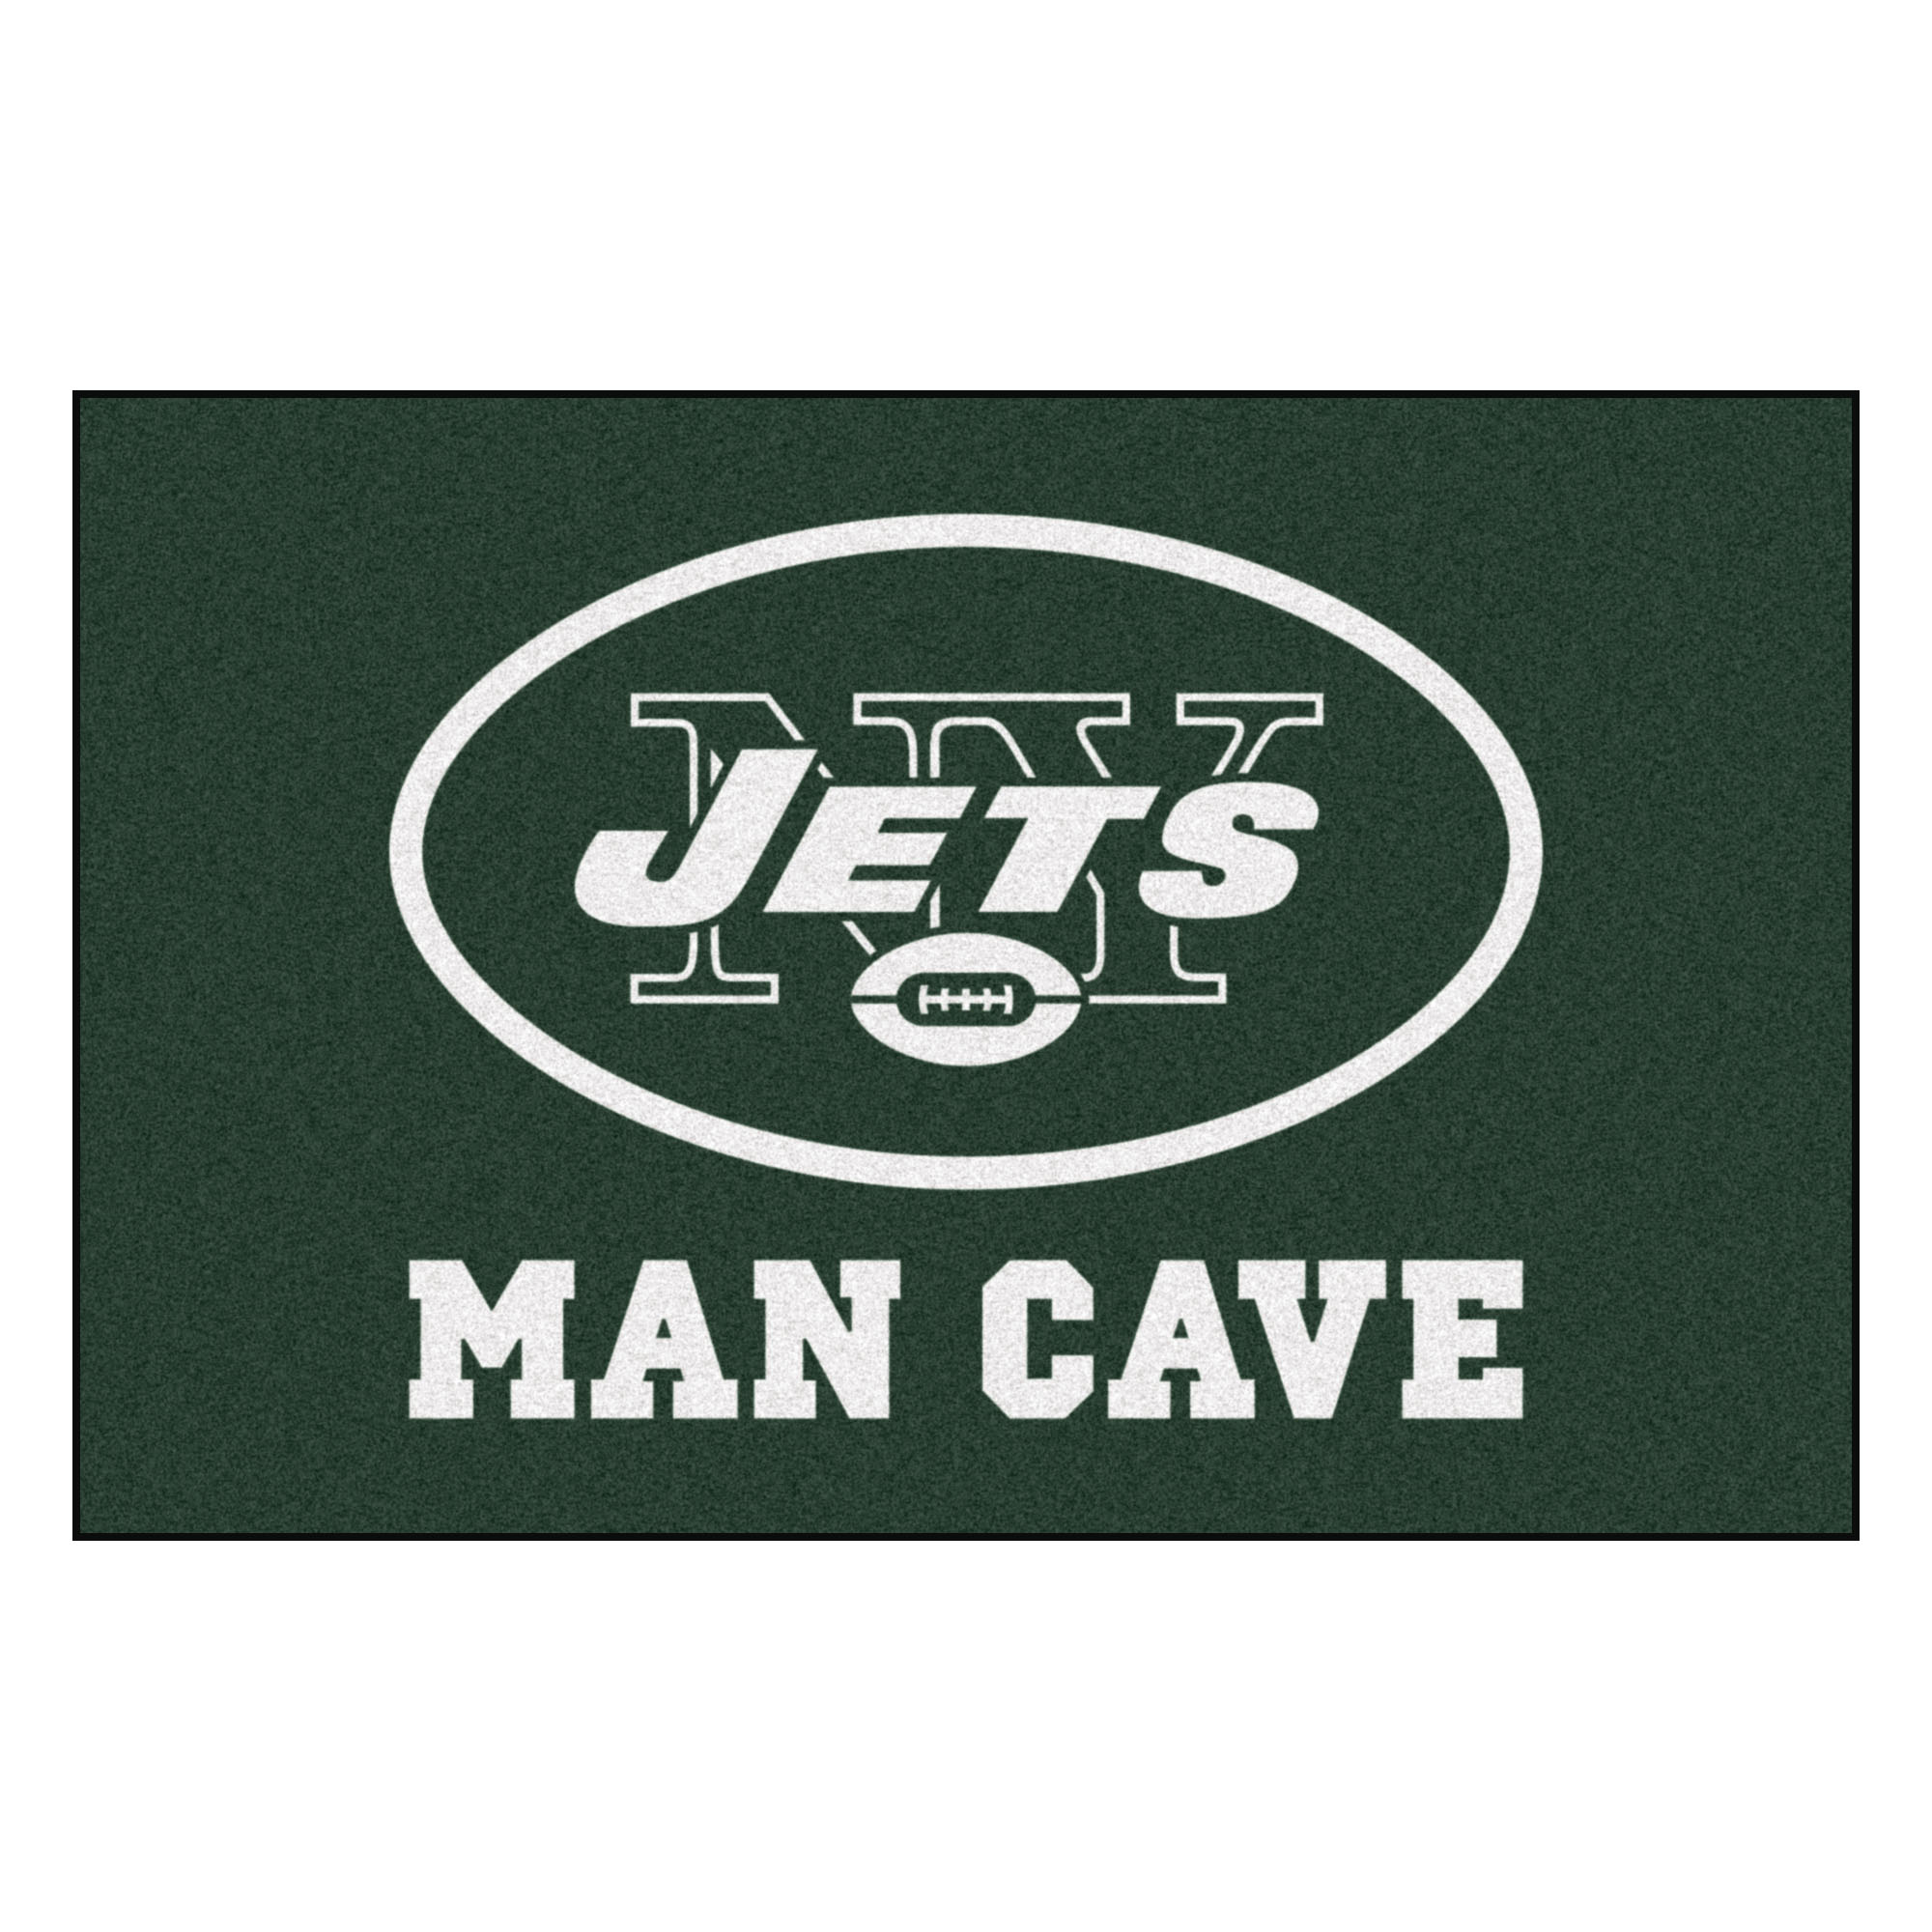 NFL New York Jets Man Cave Starter Rectangular Mat Area Rug